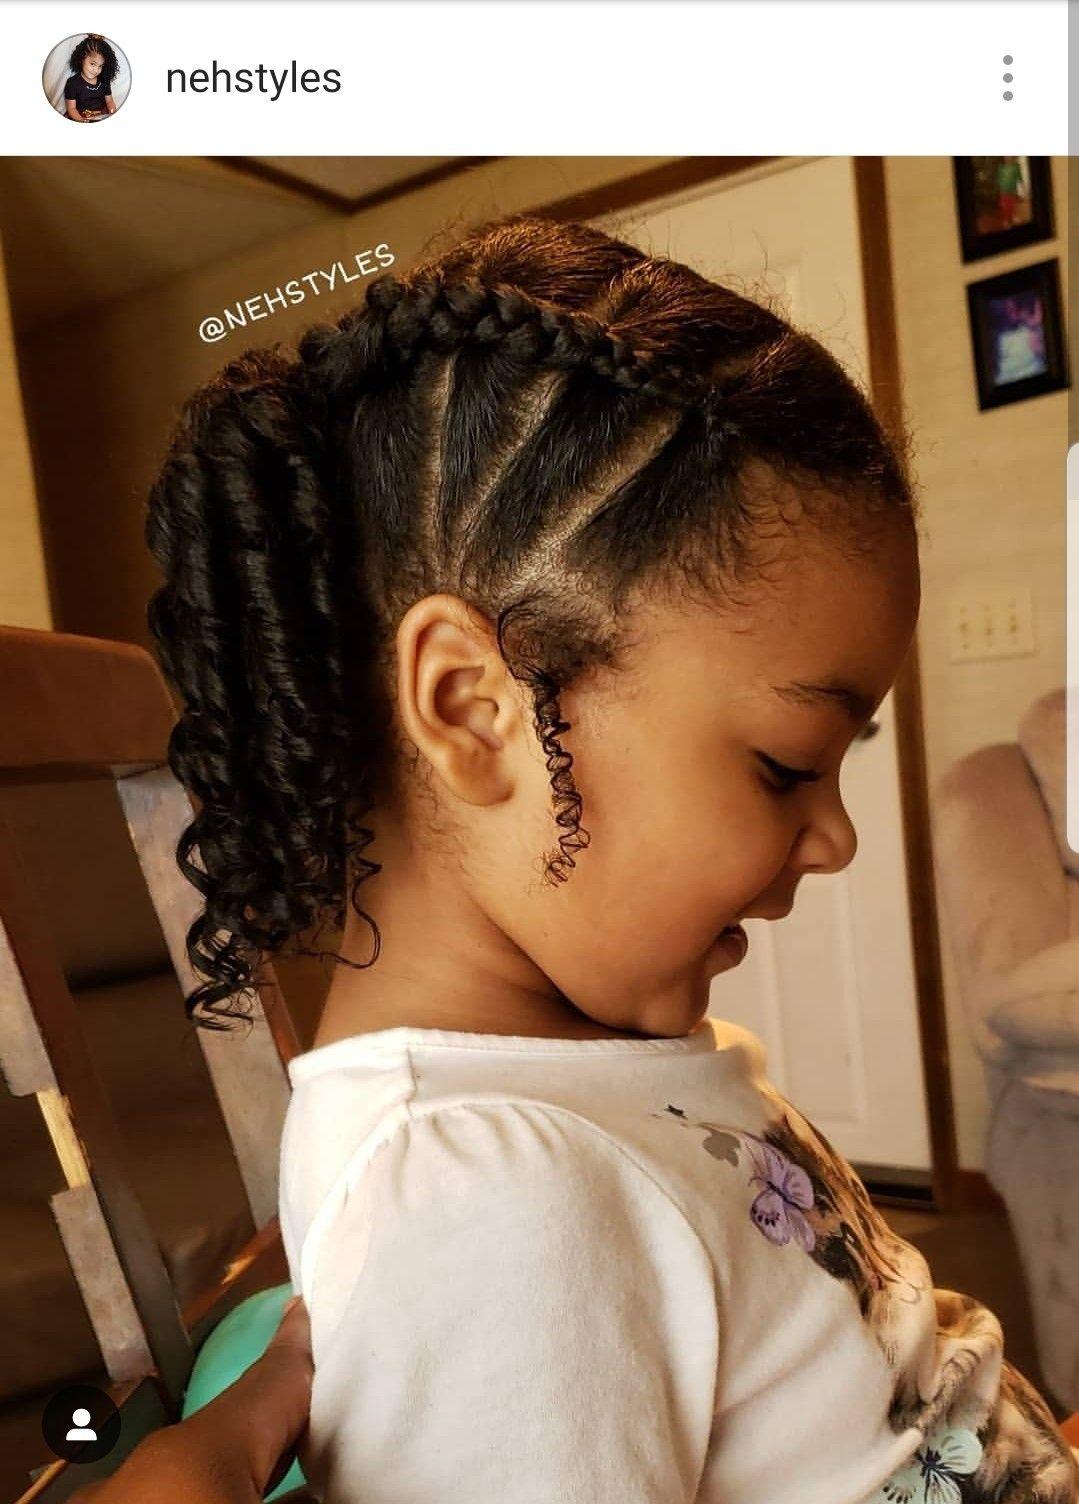 Little Girl Hairstyle Hair Styles Mixed Girl Hairstyles Biracial Hair